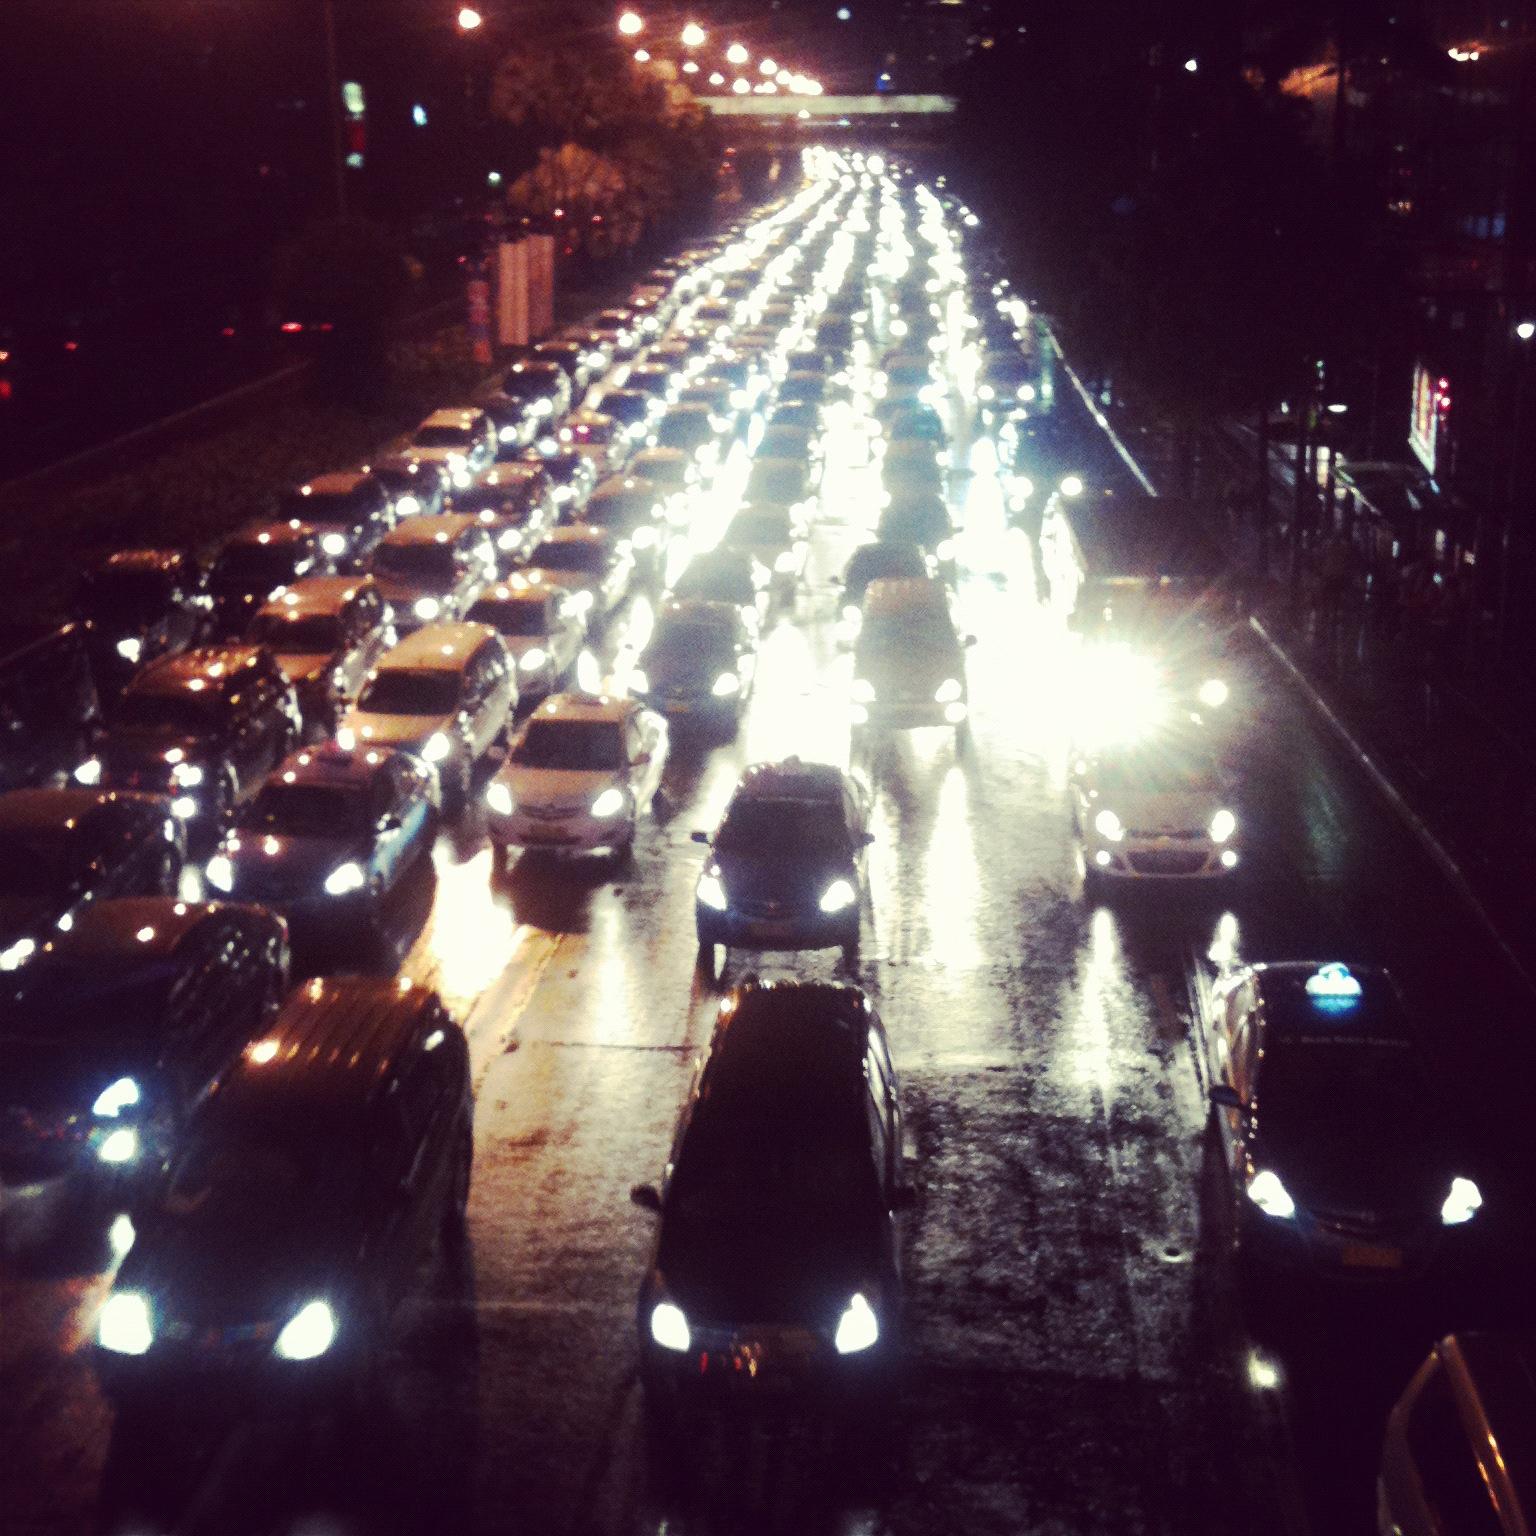 Jakarta, business as usual. Photo credit: Natalie Sambhi